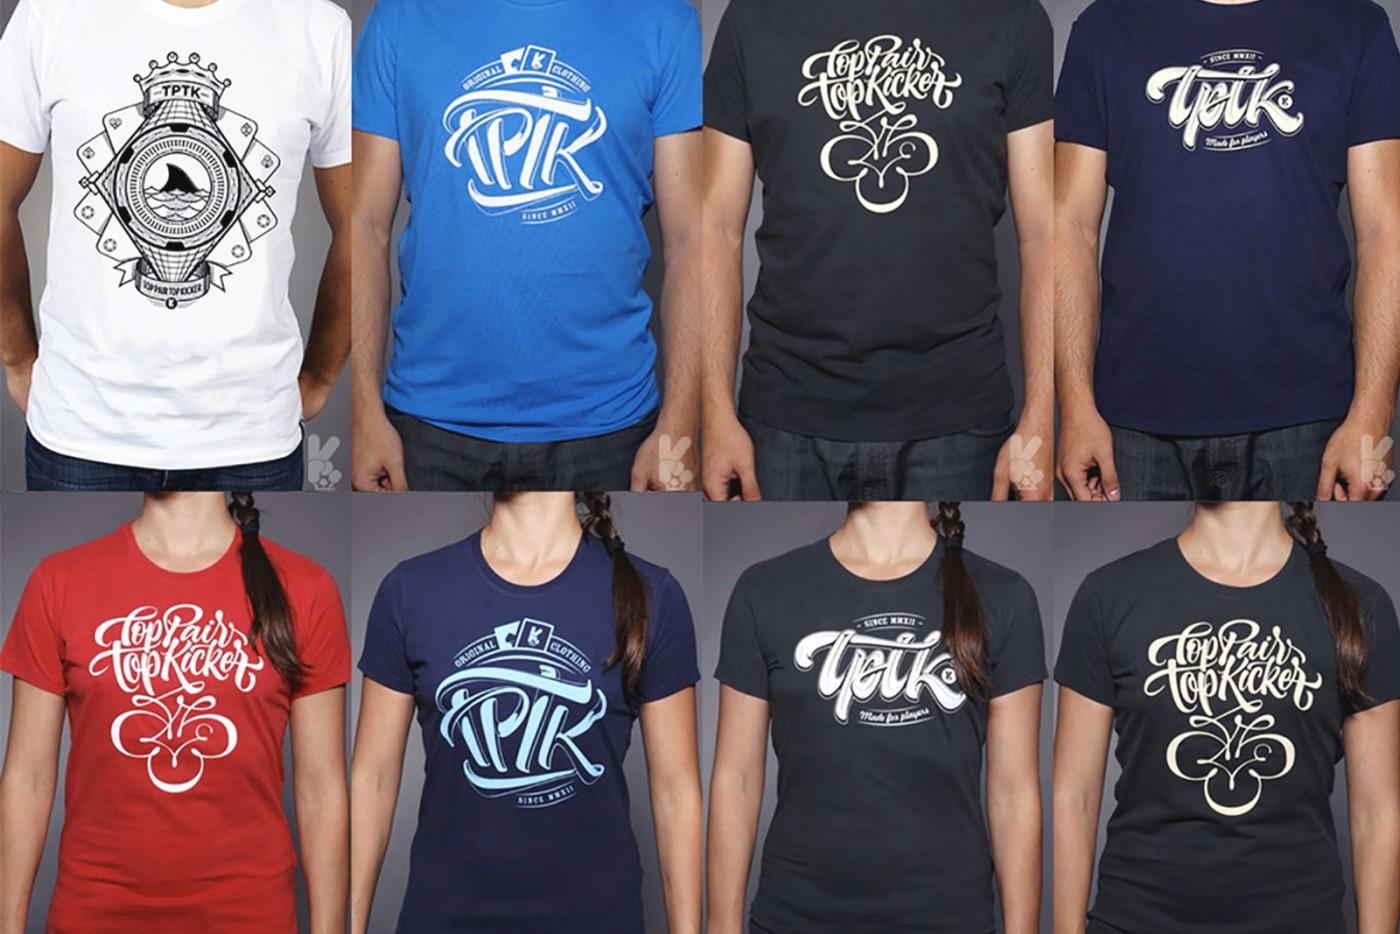 TPTK, quand le street-clothing rencontre le poker